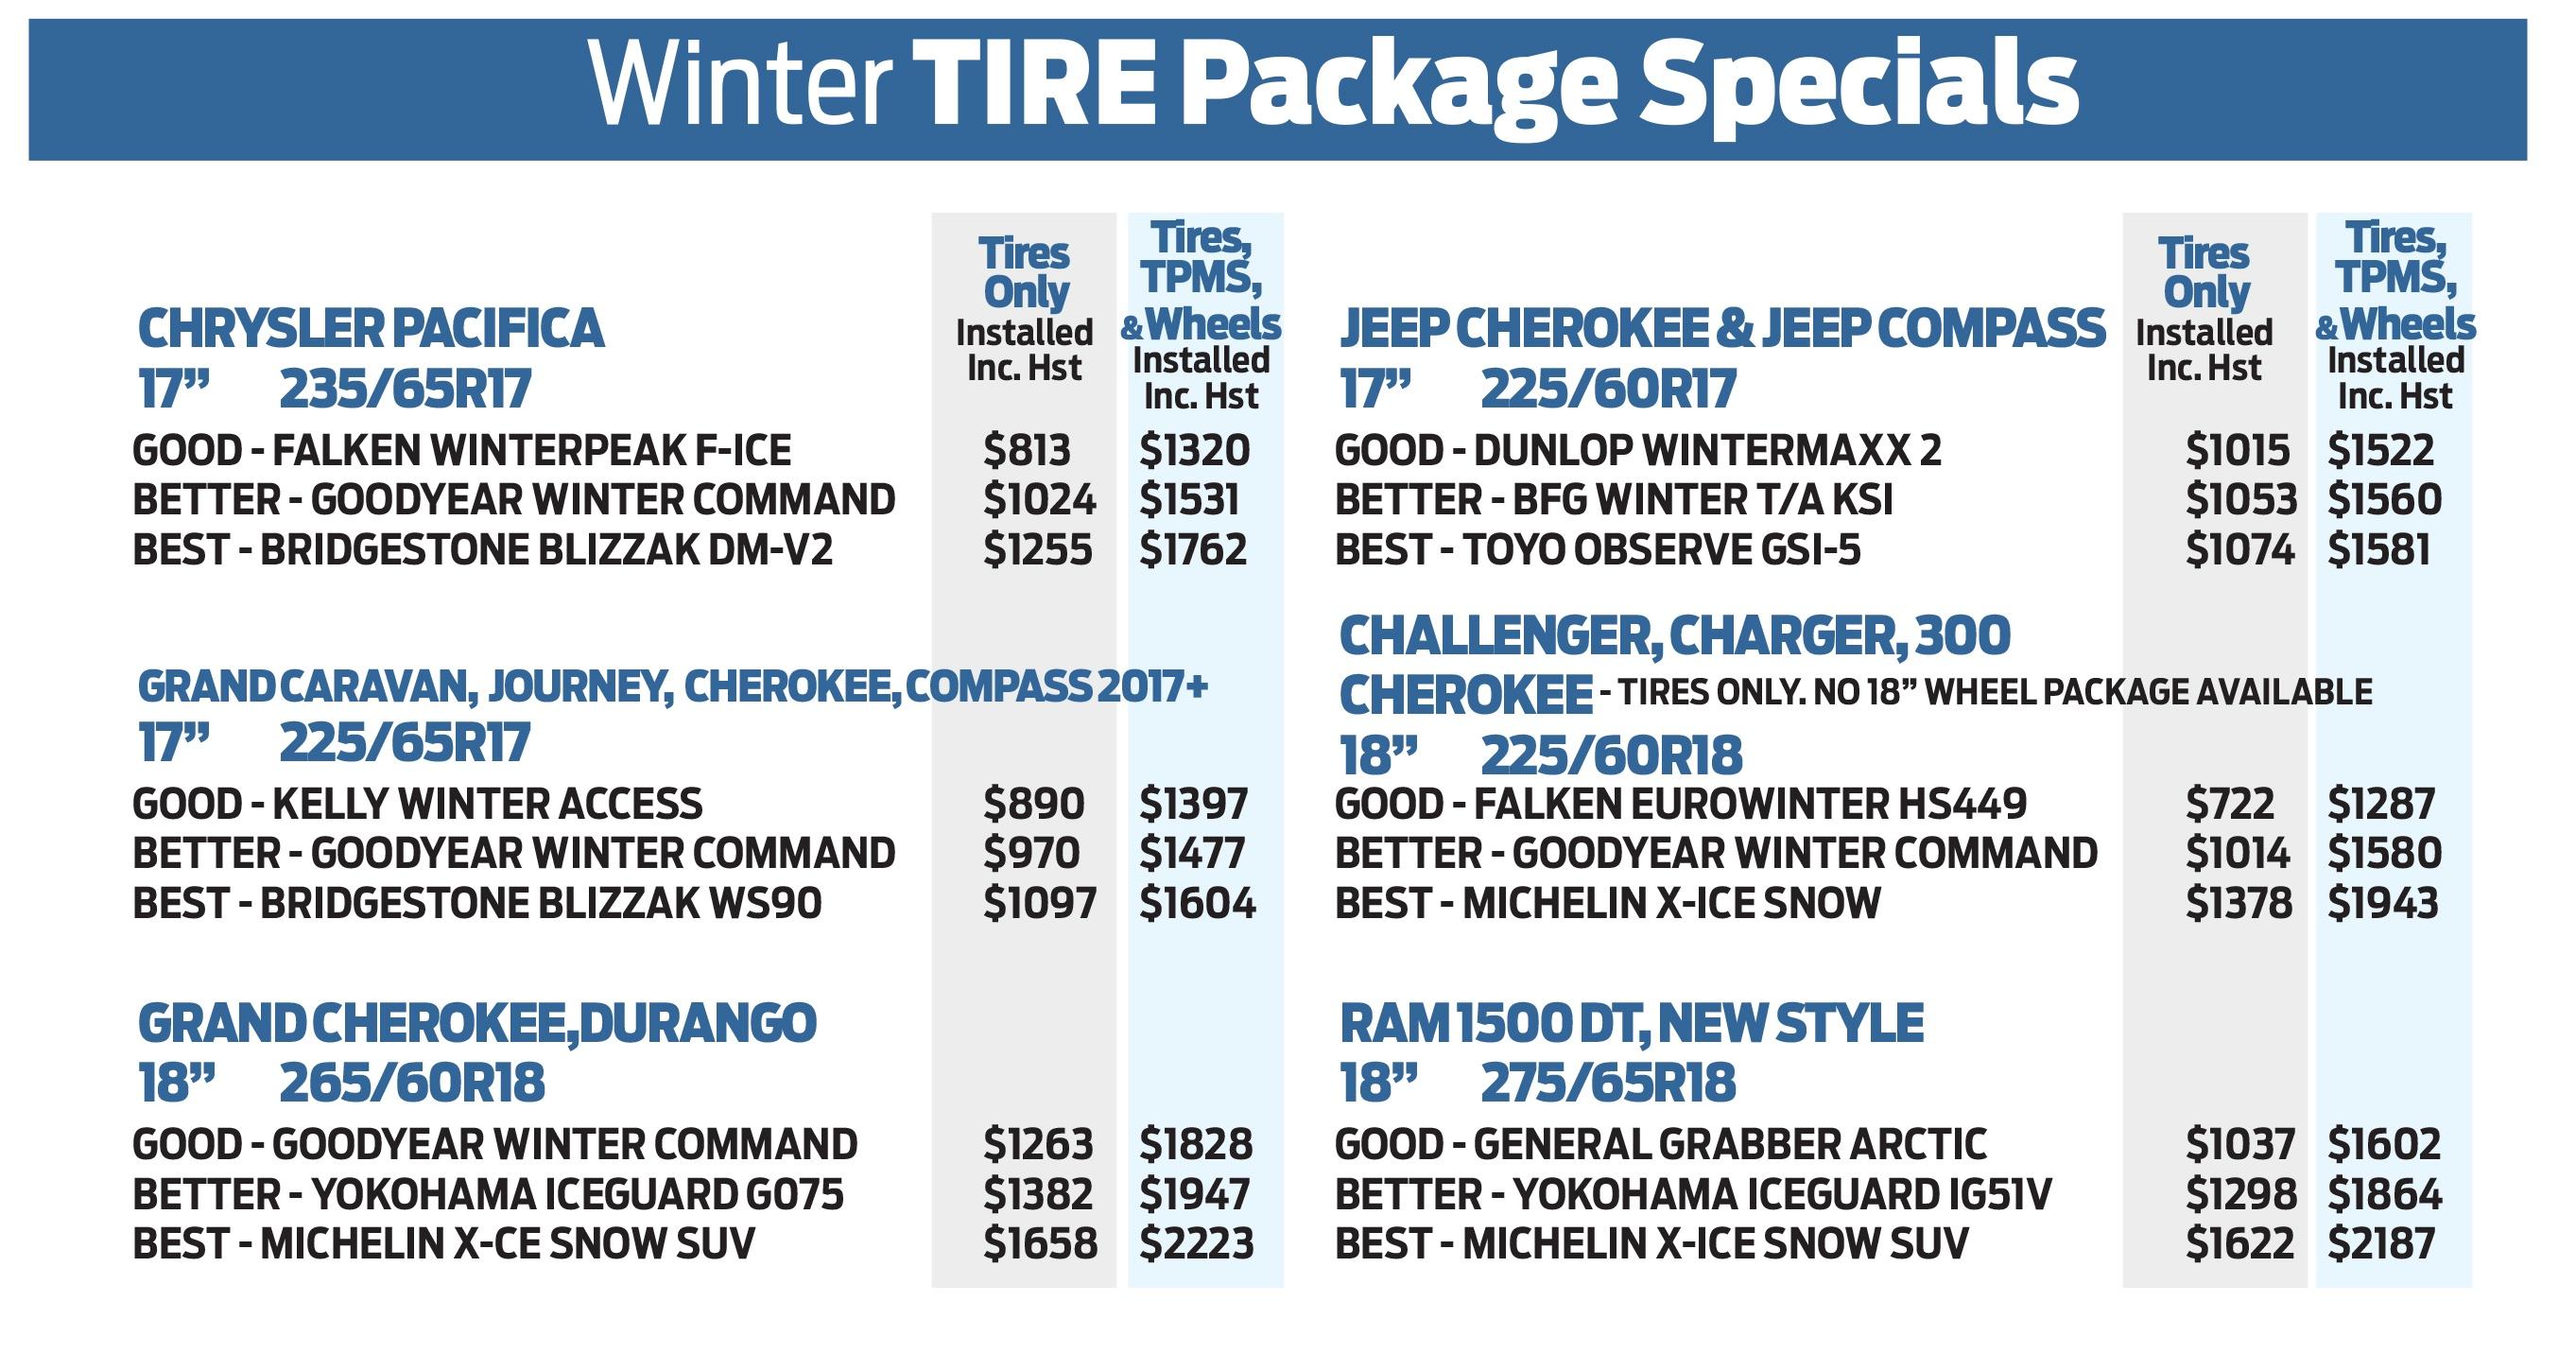 Winter Tire Specials - Brampton Chrysler Dodge Jeep Ram